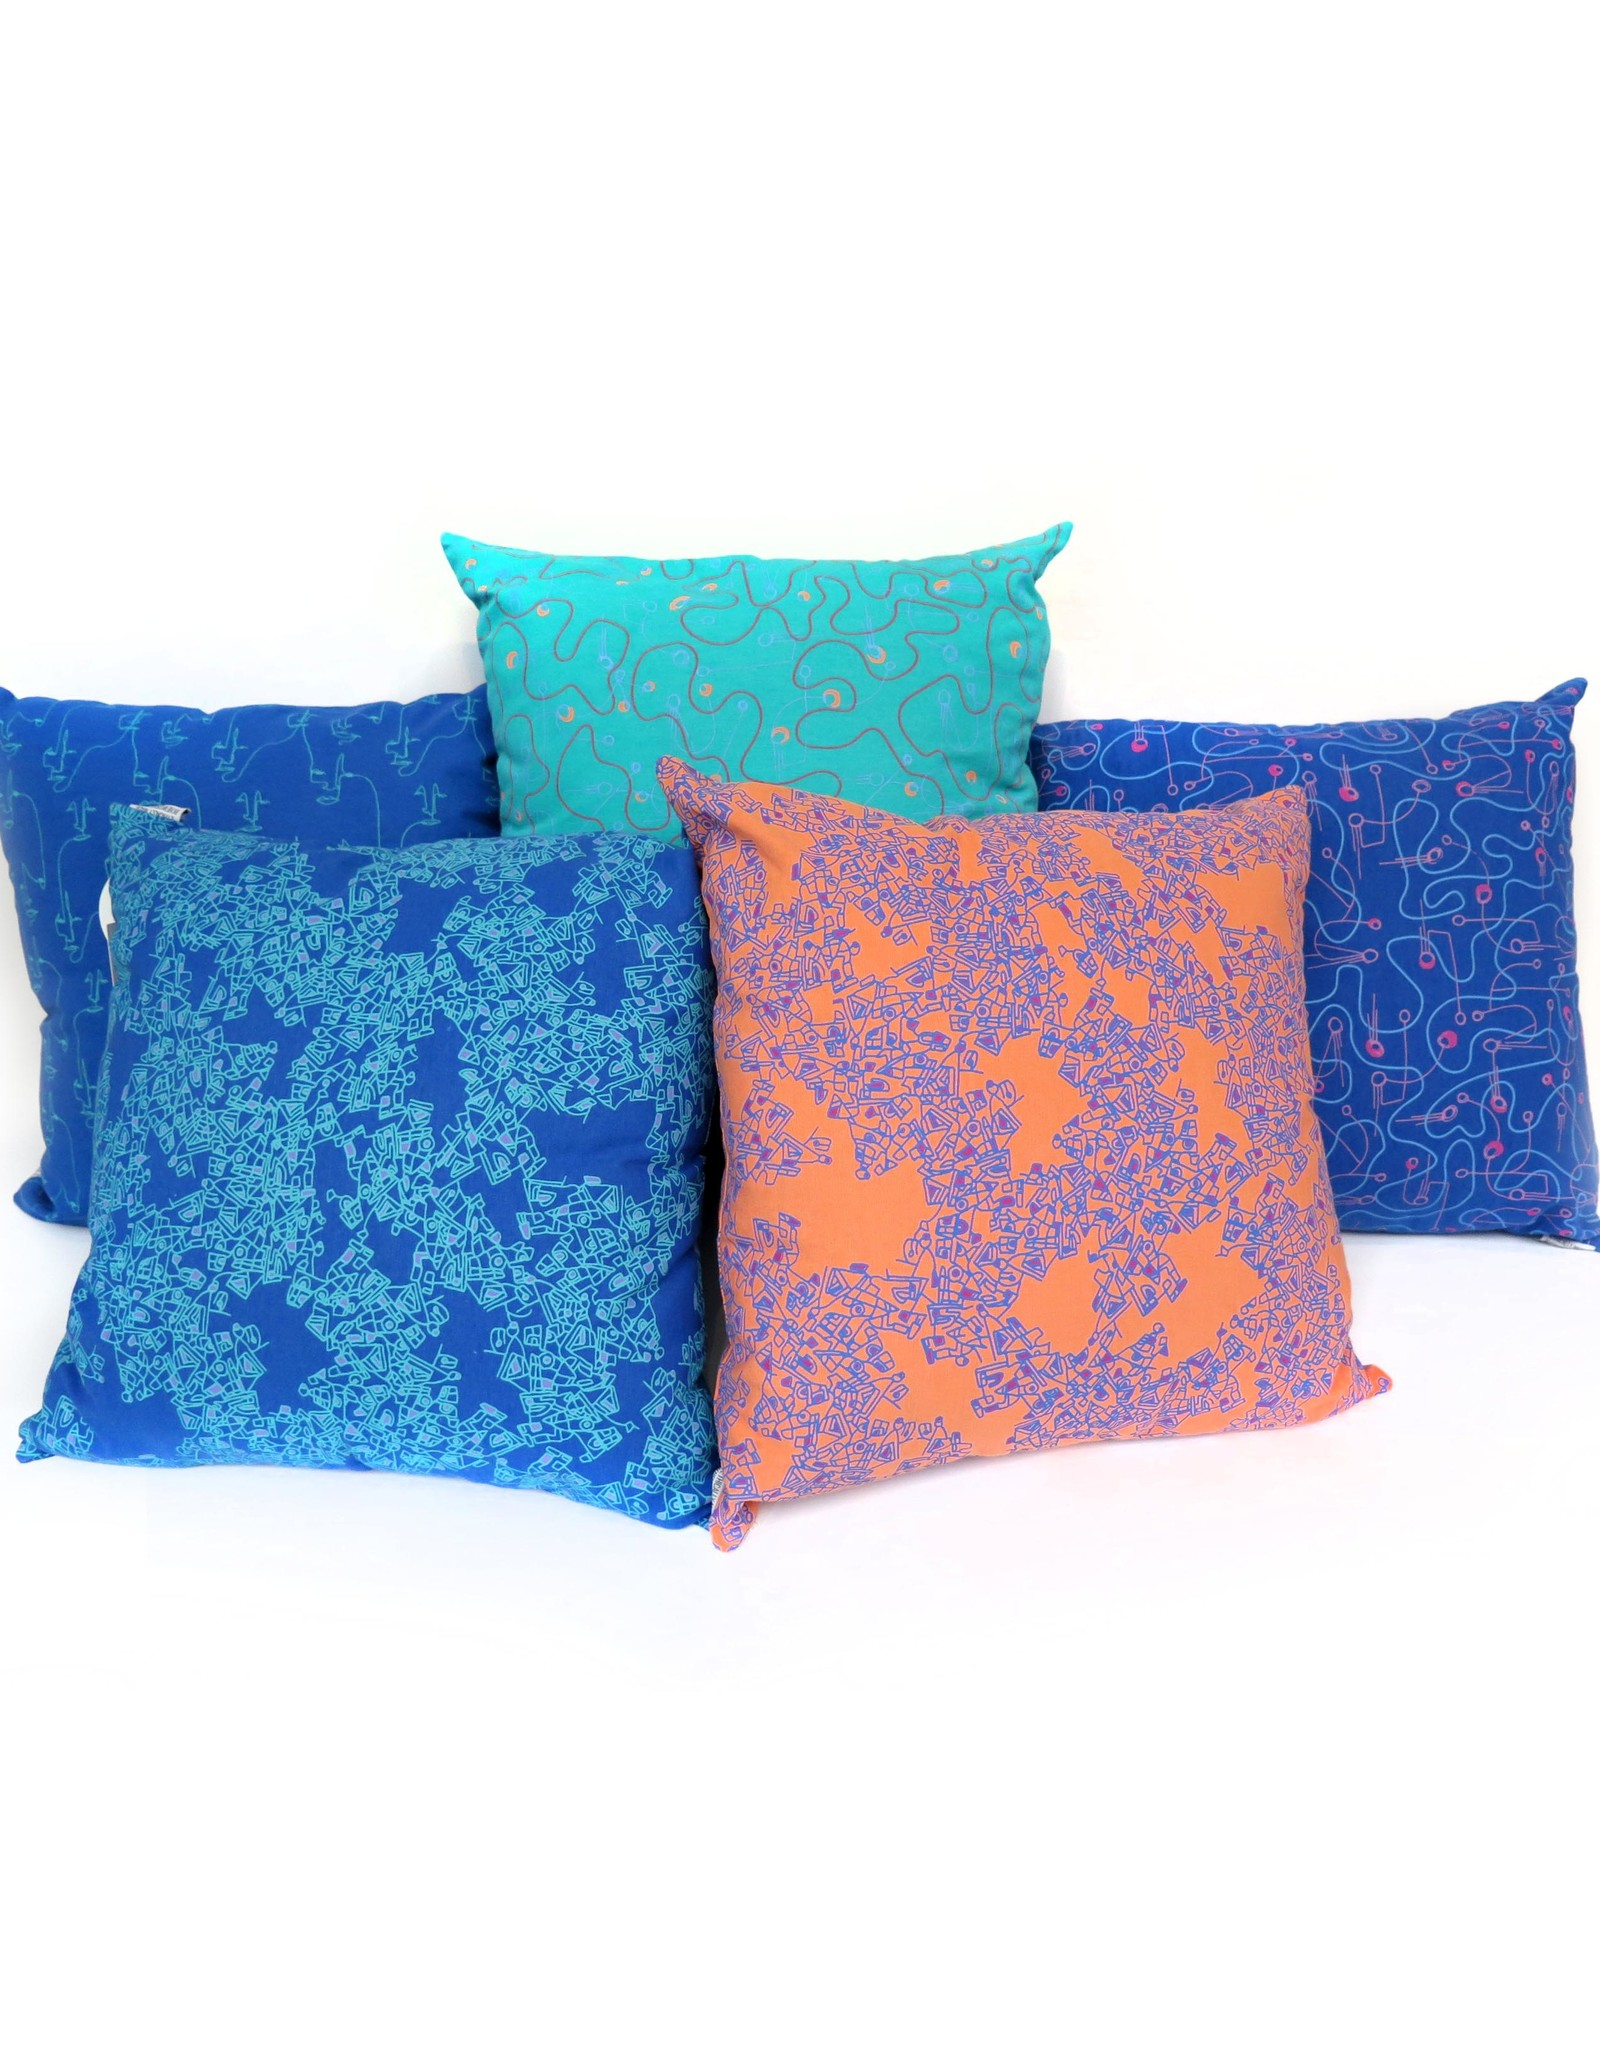 FAces (blue) pillow  PINTL + KYET